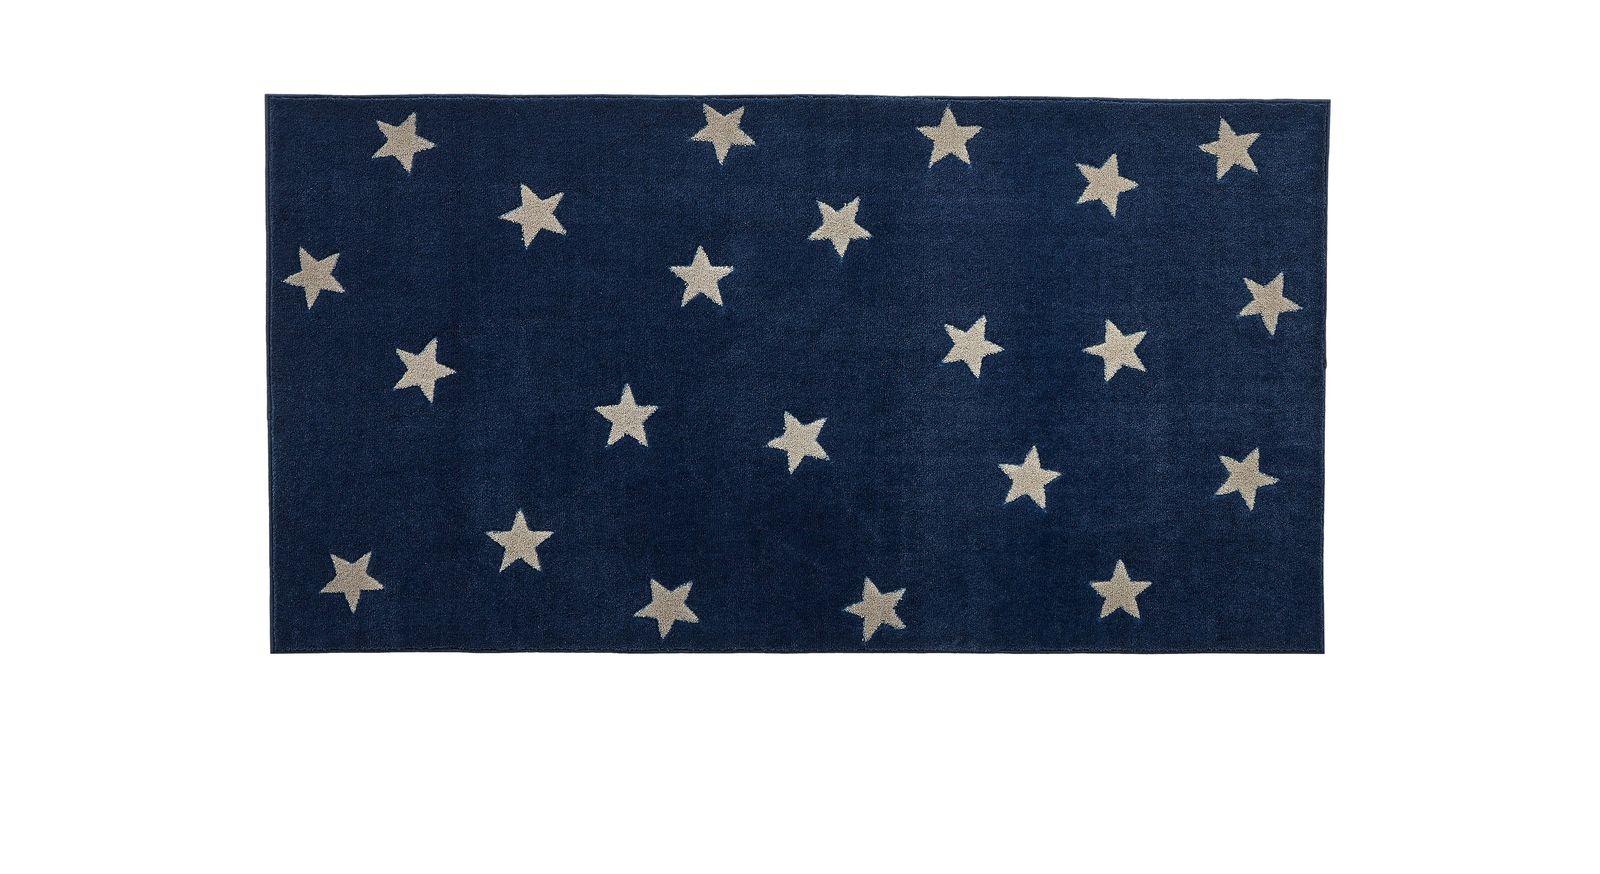 LIFEETIME Teppich Sterne in der Farbe blau